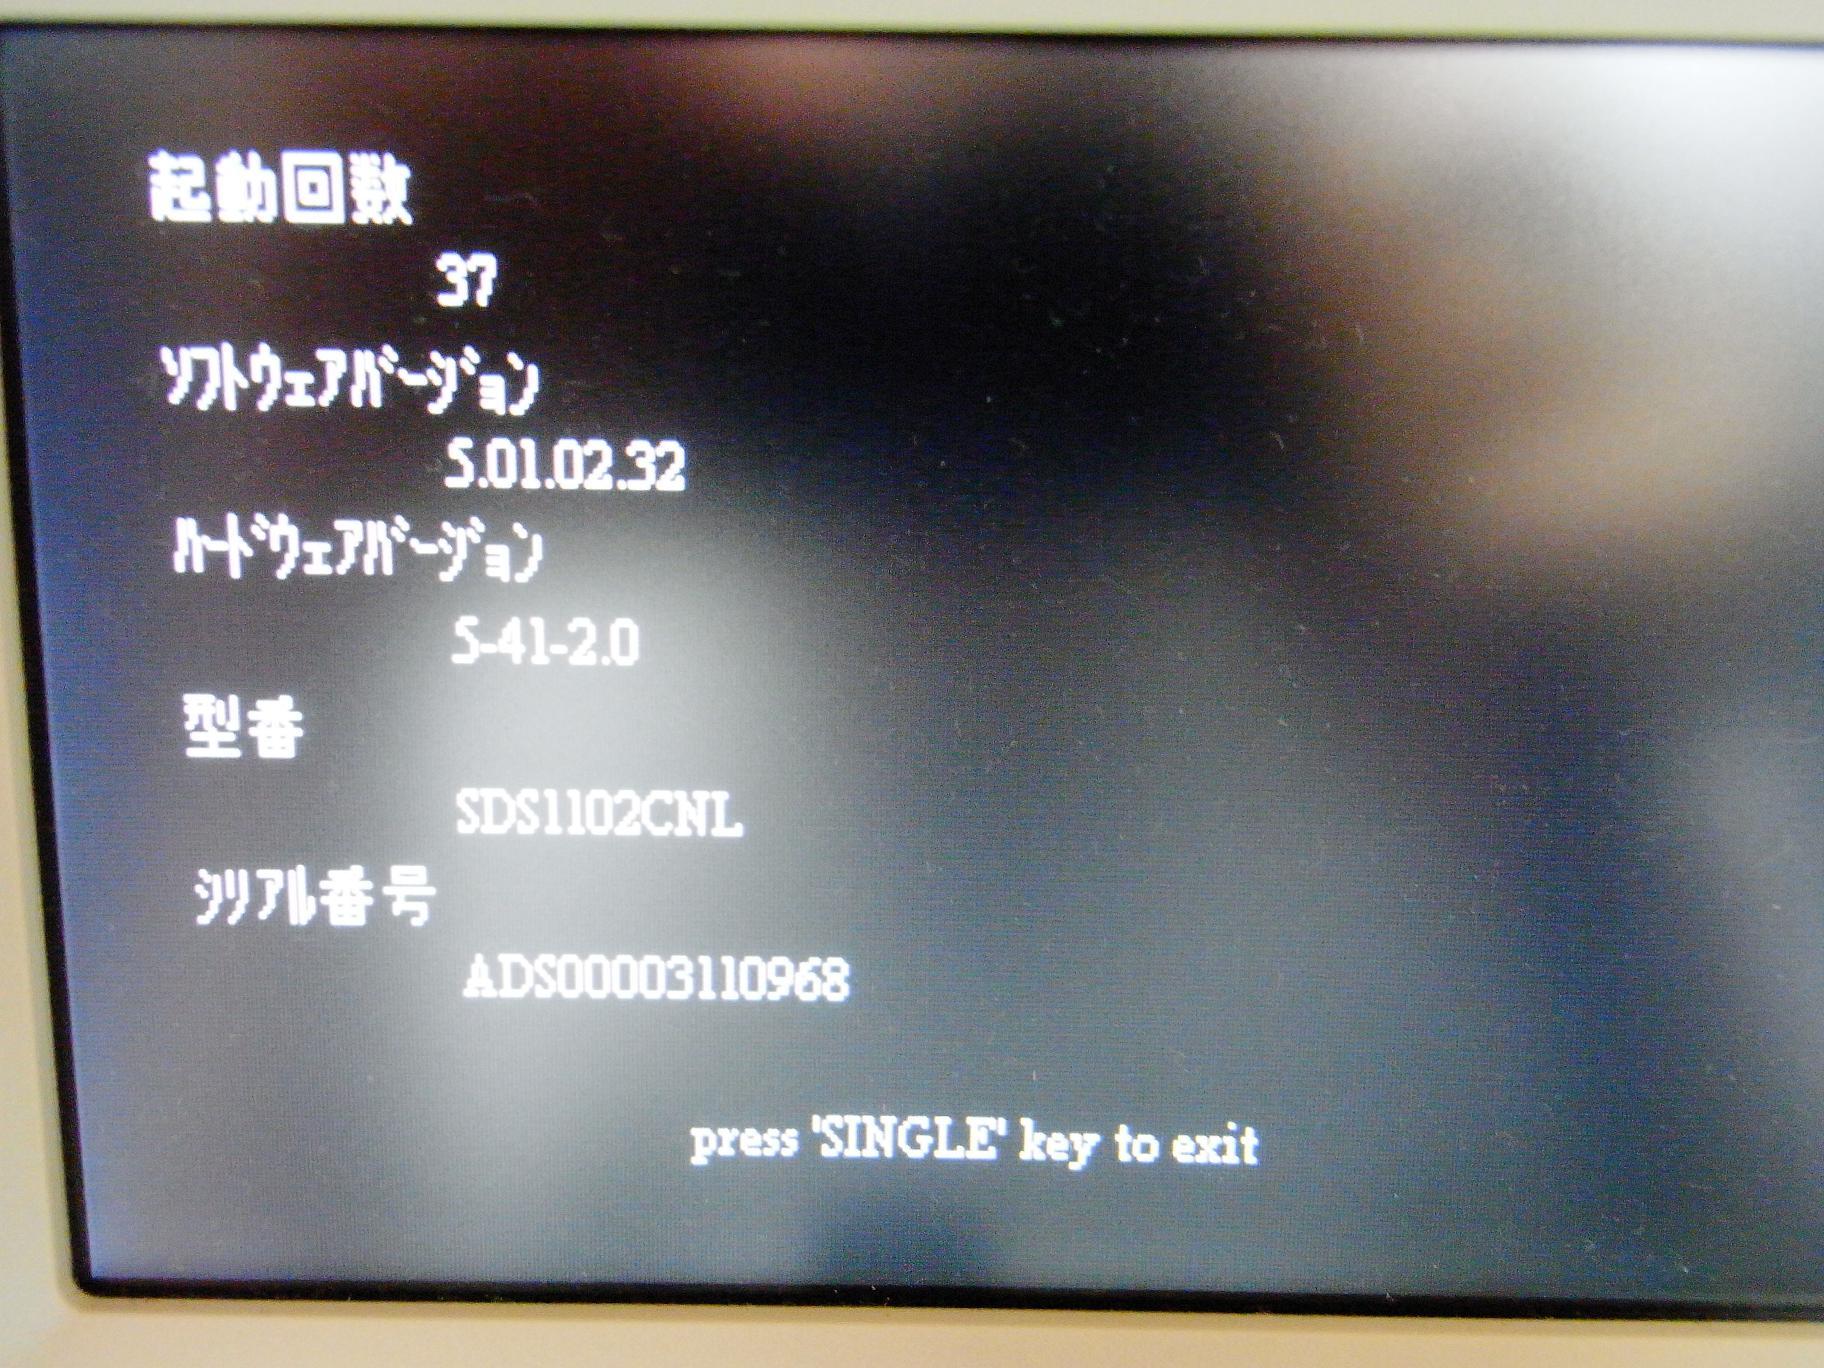 ATTEN ADS1102CALのファームウェア アップデート(SW:5.01.02.32)